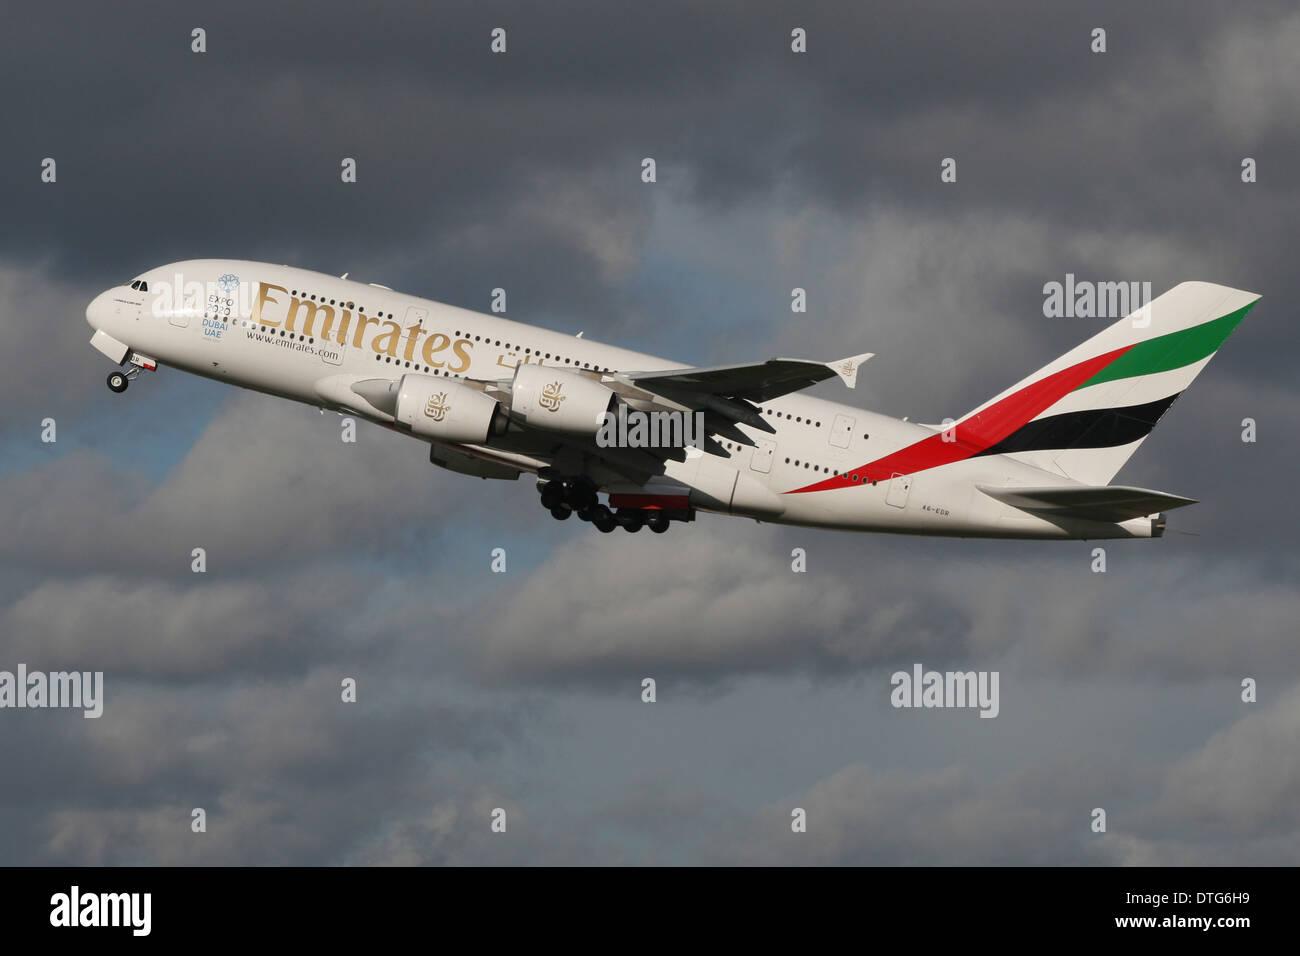 EMIRATES AIRBUS A380 JUMBO - Stock Image